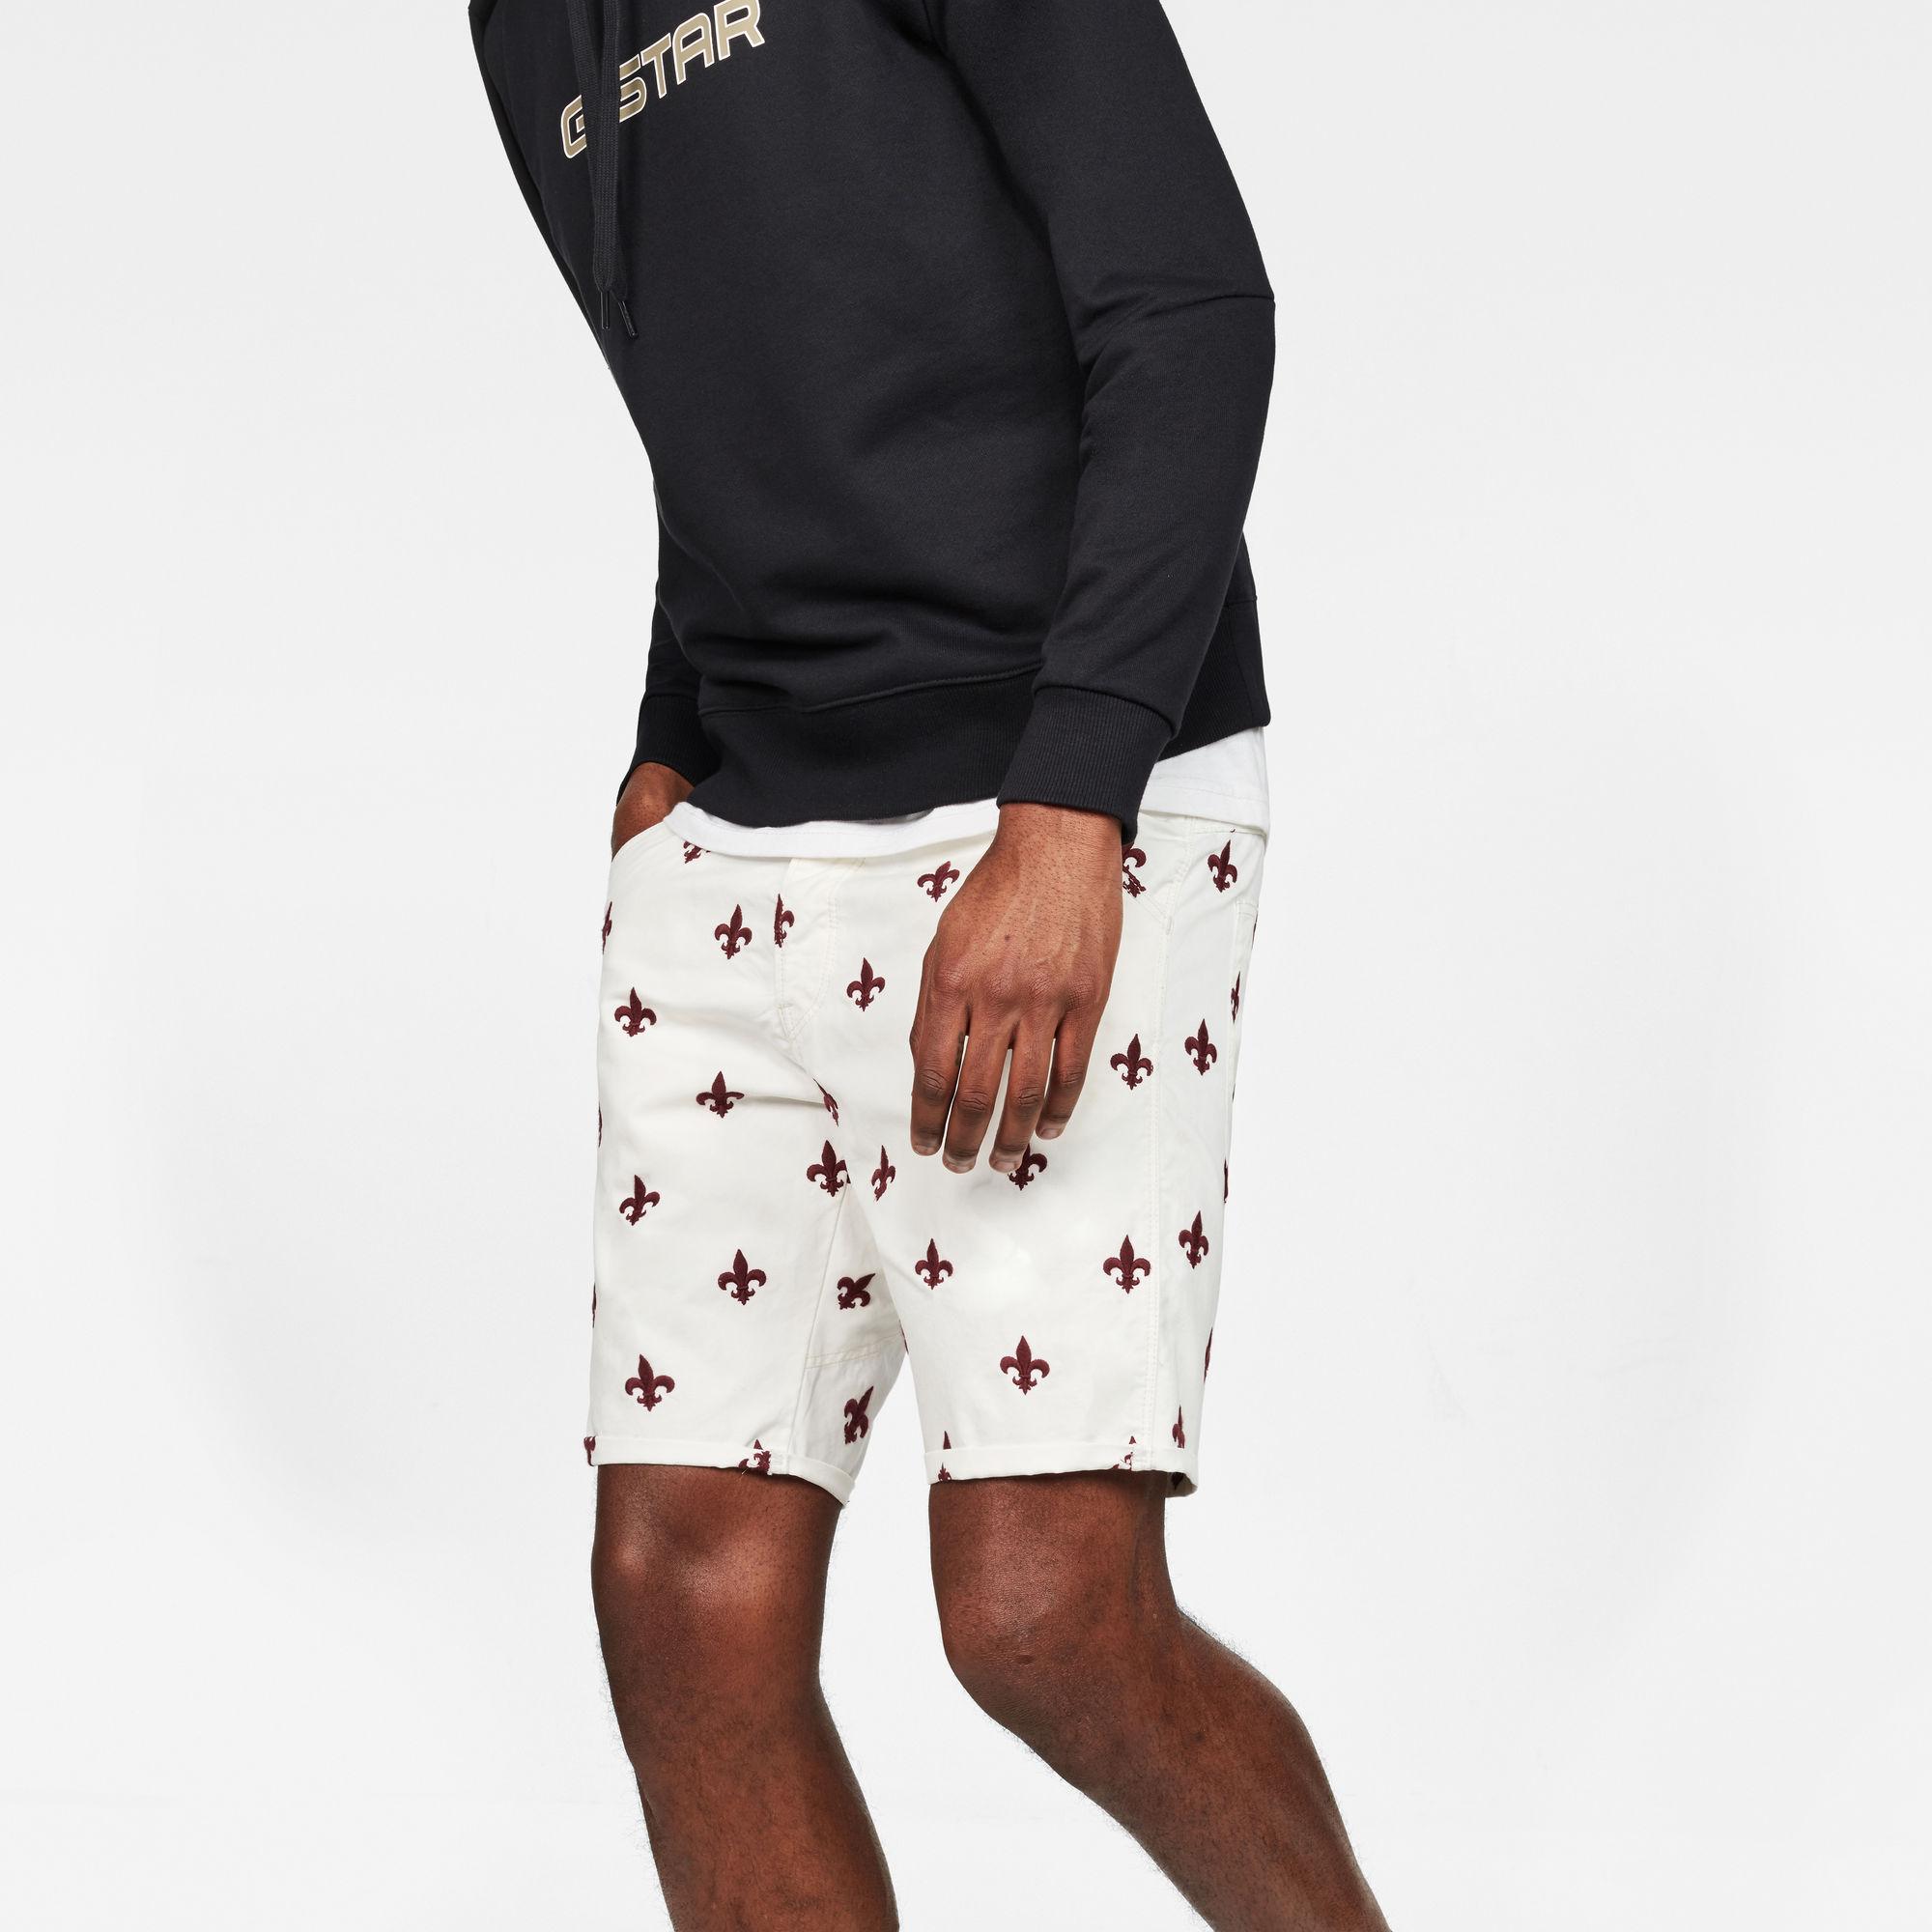 G-Star Elwood X25 3D Tapered Men's Shorts